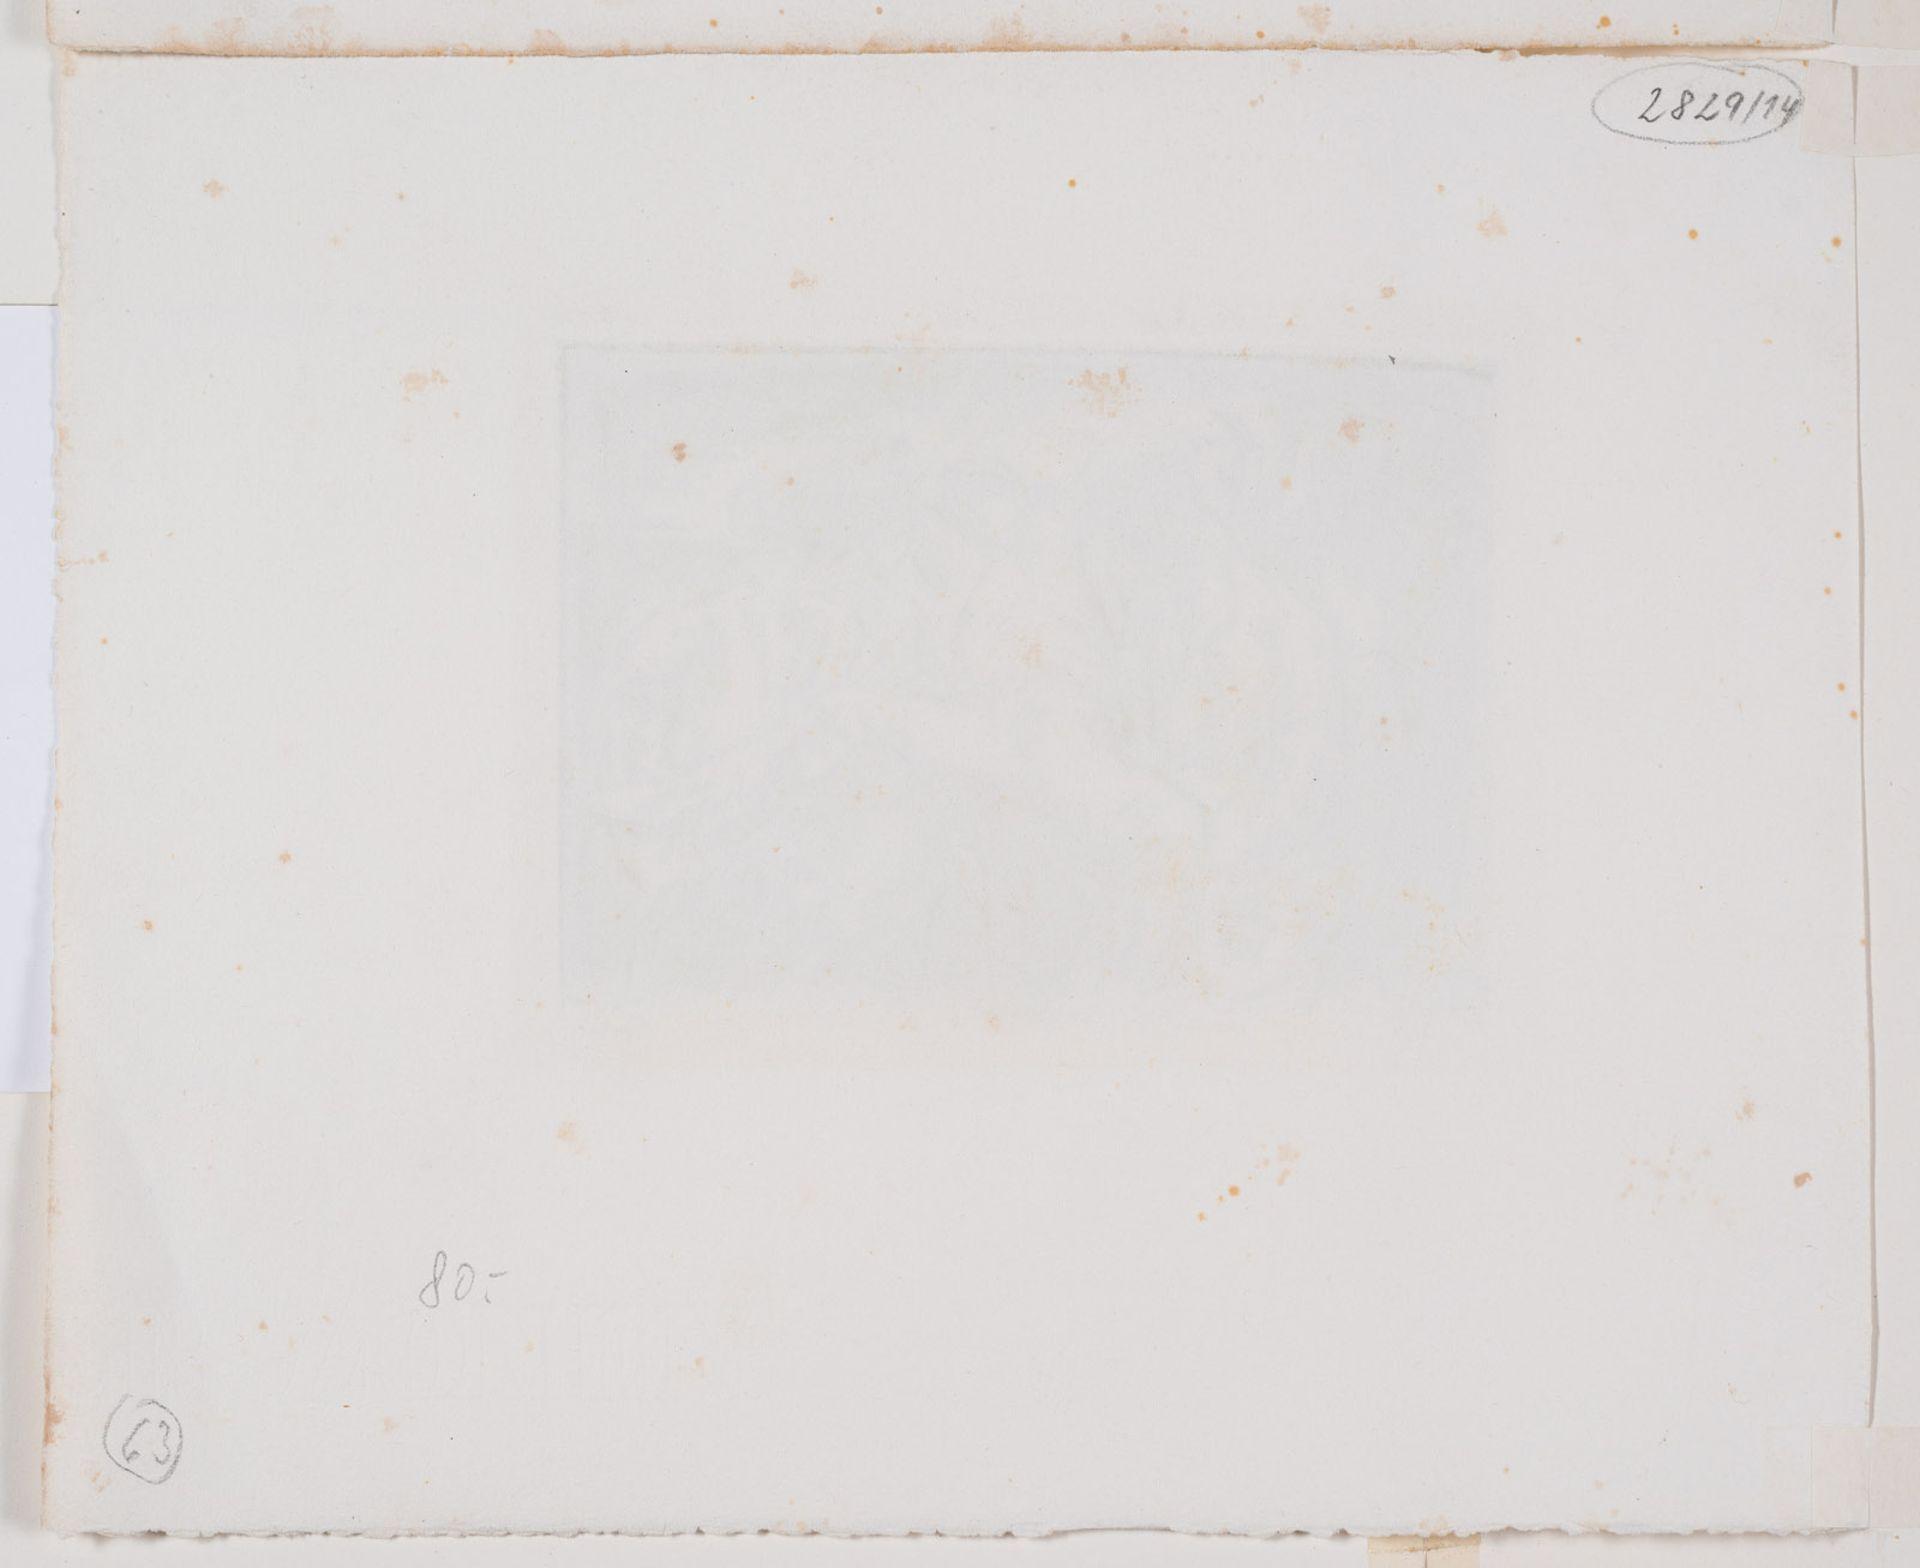 Geiger, Willi - Image 20 of 22